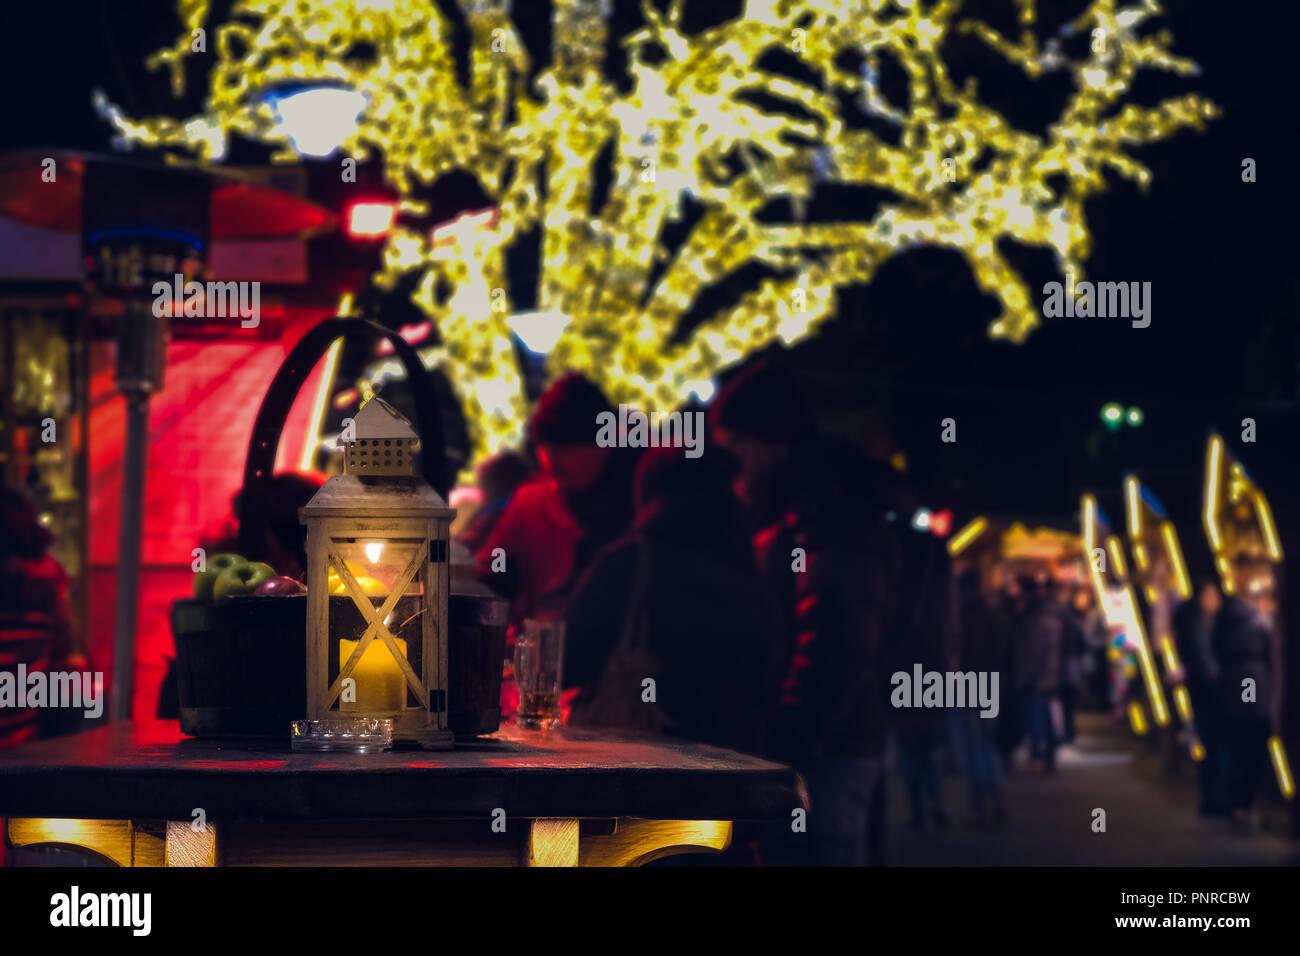 lantern light table christmas markets night stall Bressanone Bolzano Europe - Stock Image